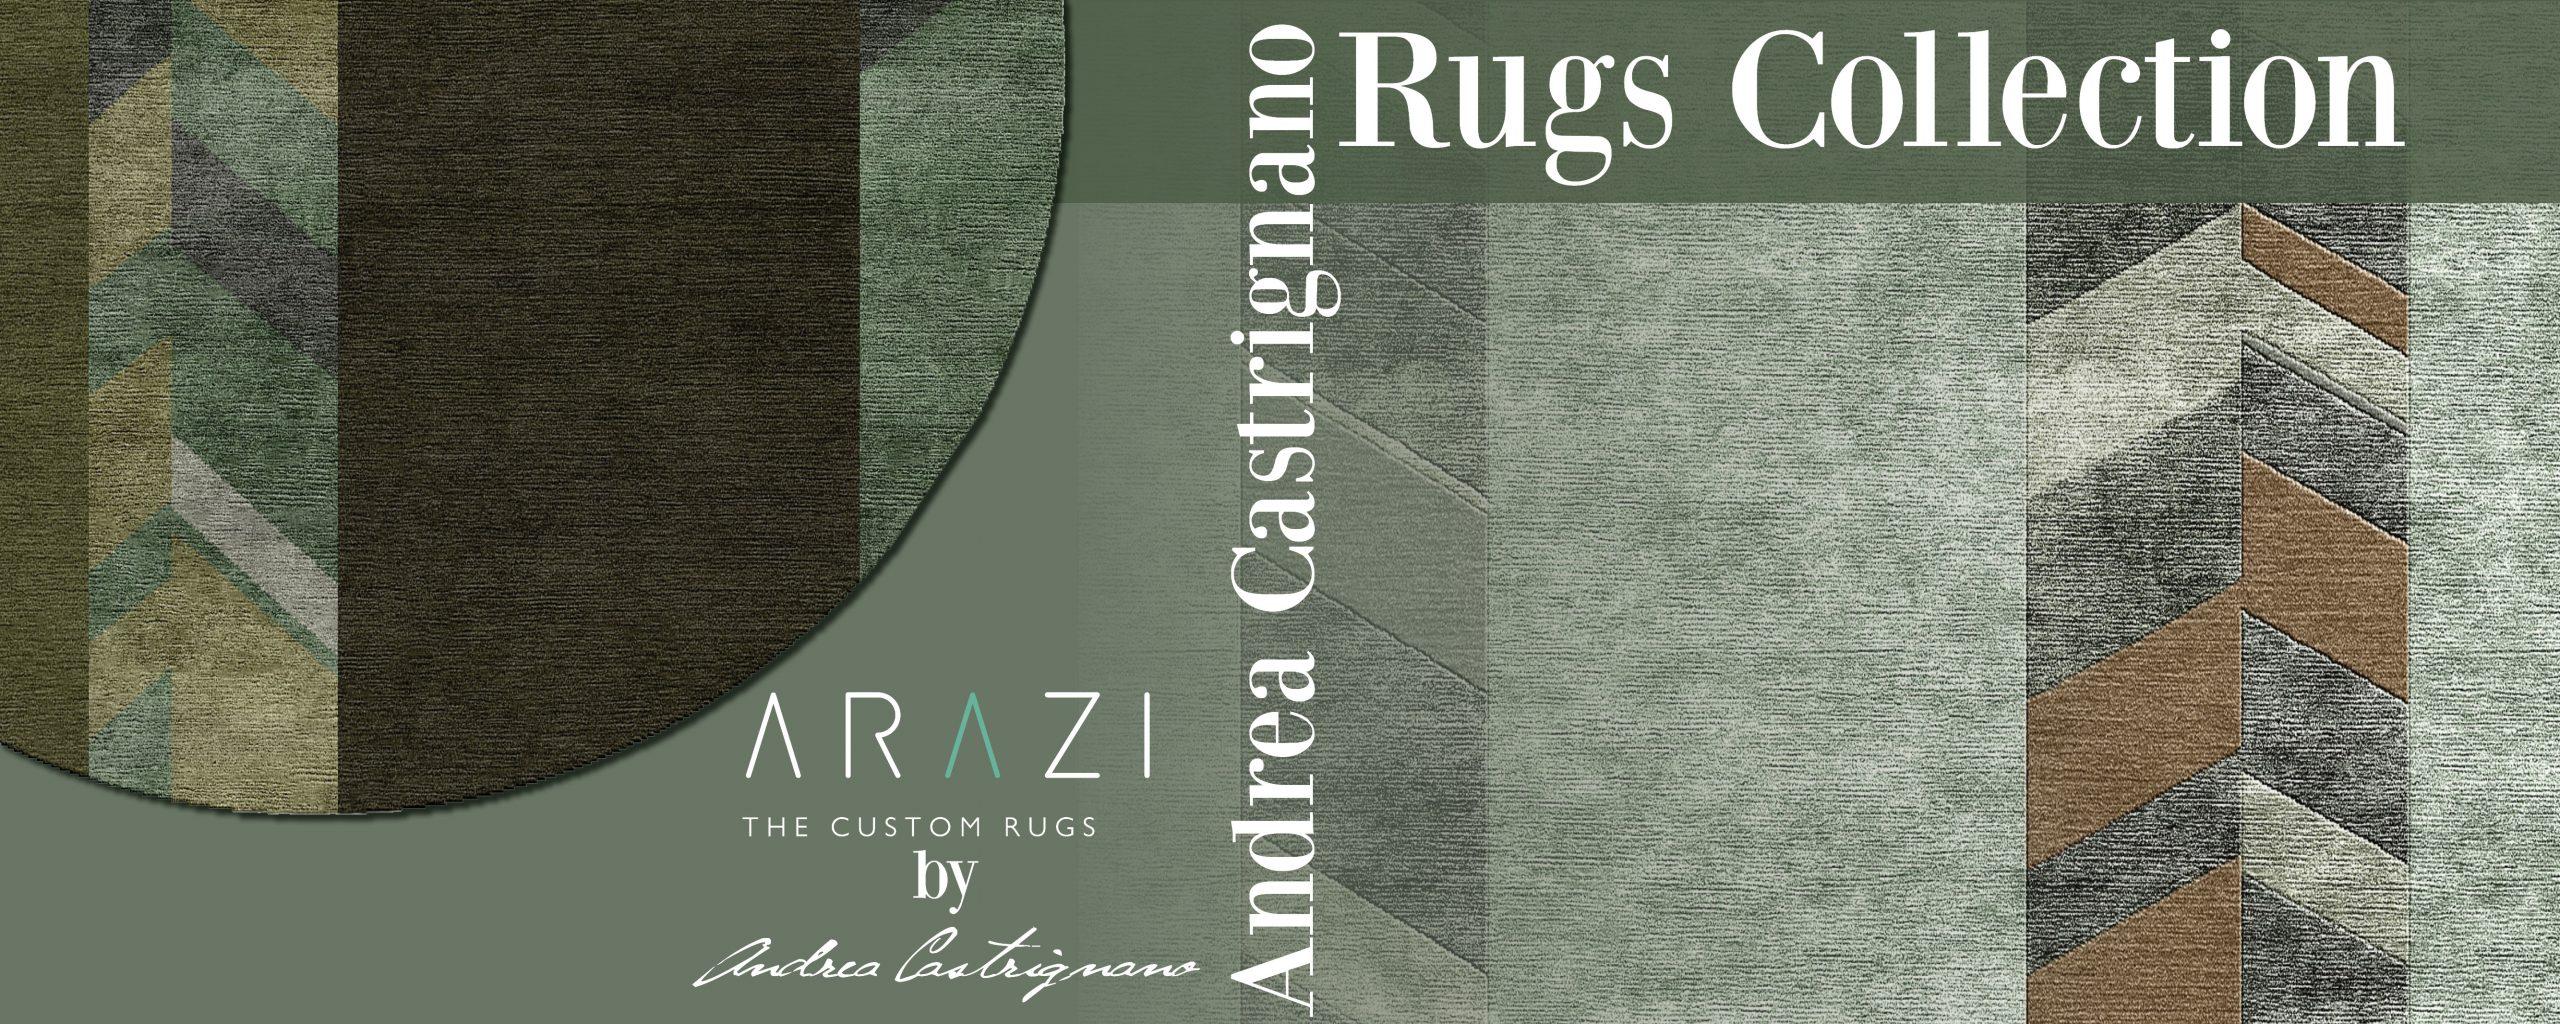 Andrea Castrignano Rugs Collection_Img